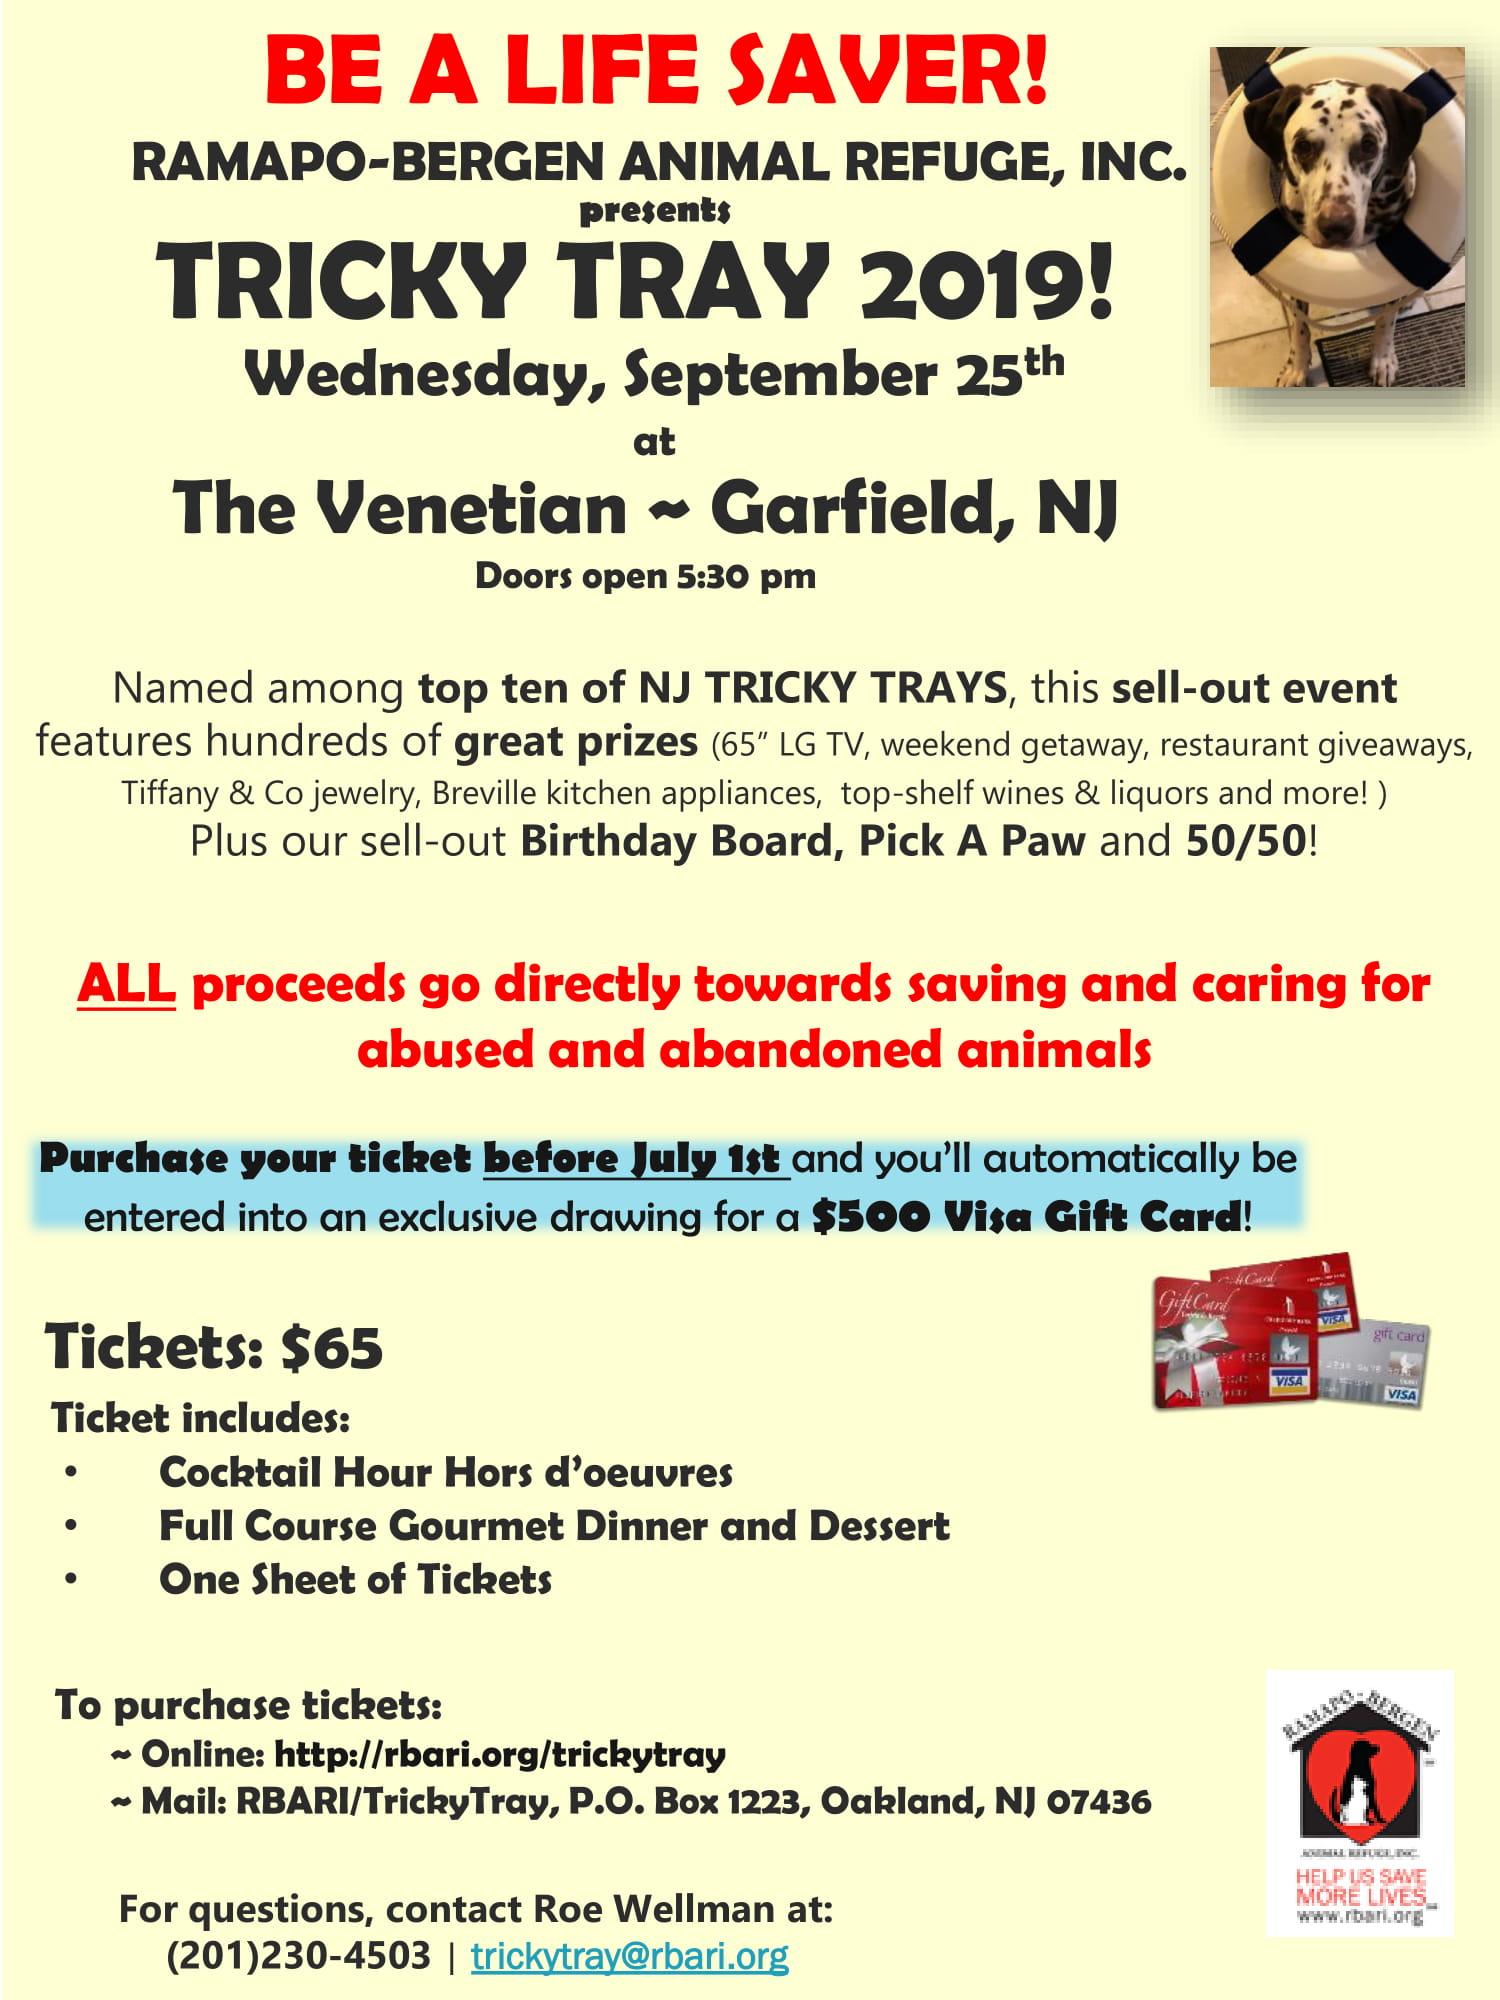 RBARI Annual Tricky Tray 2019